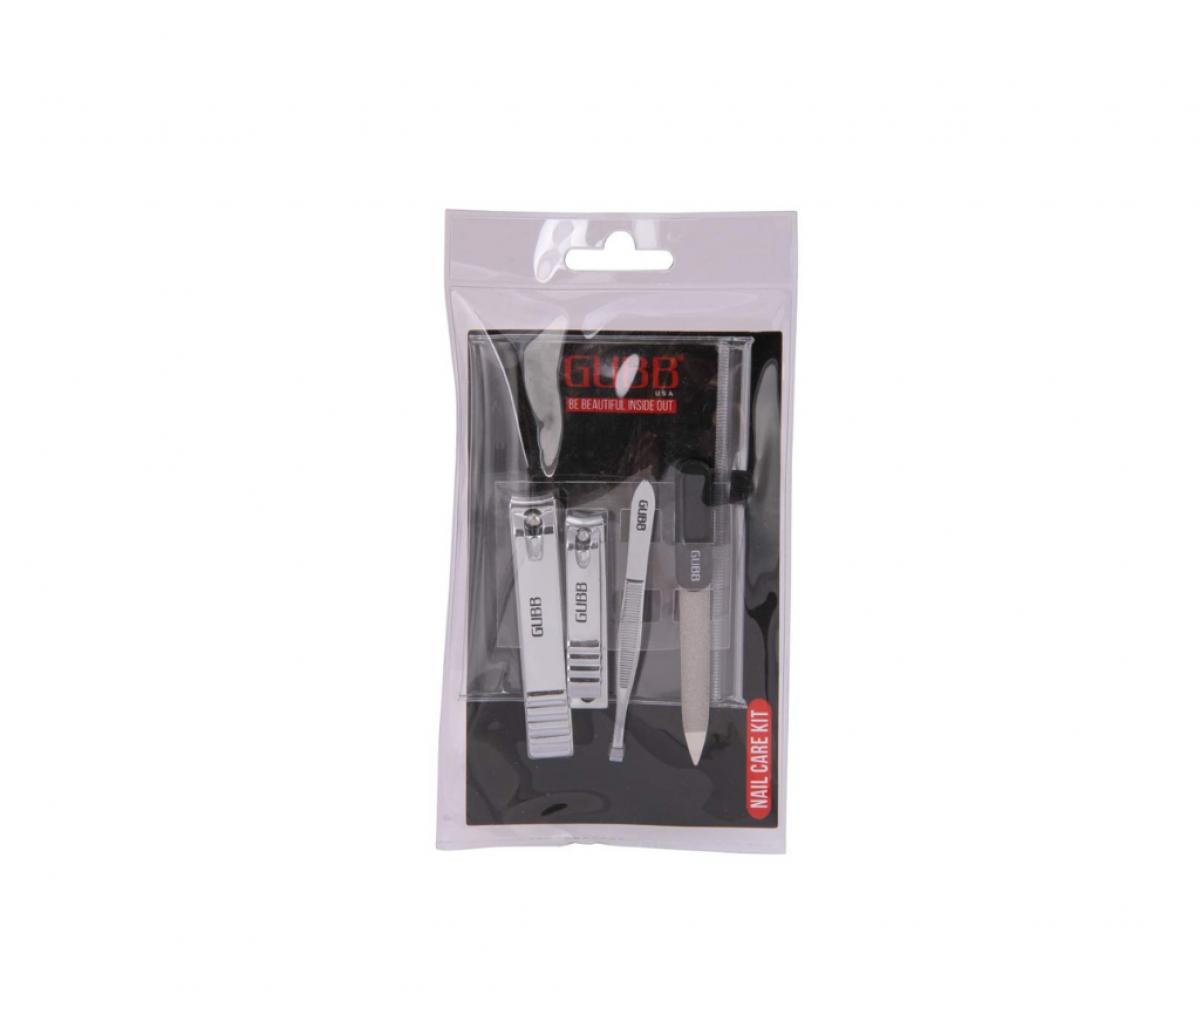 GUBB Nail Care Kit